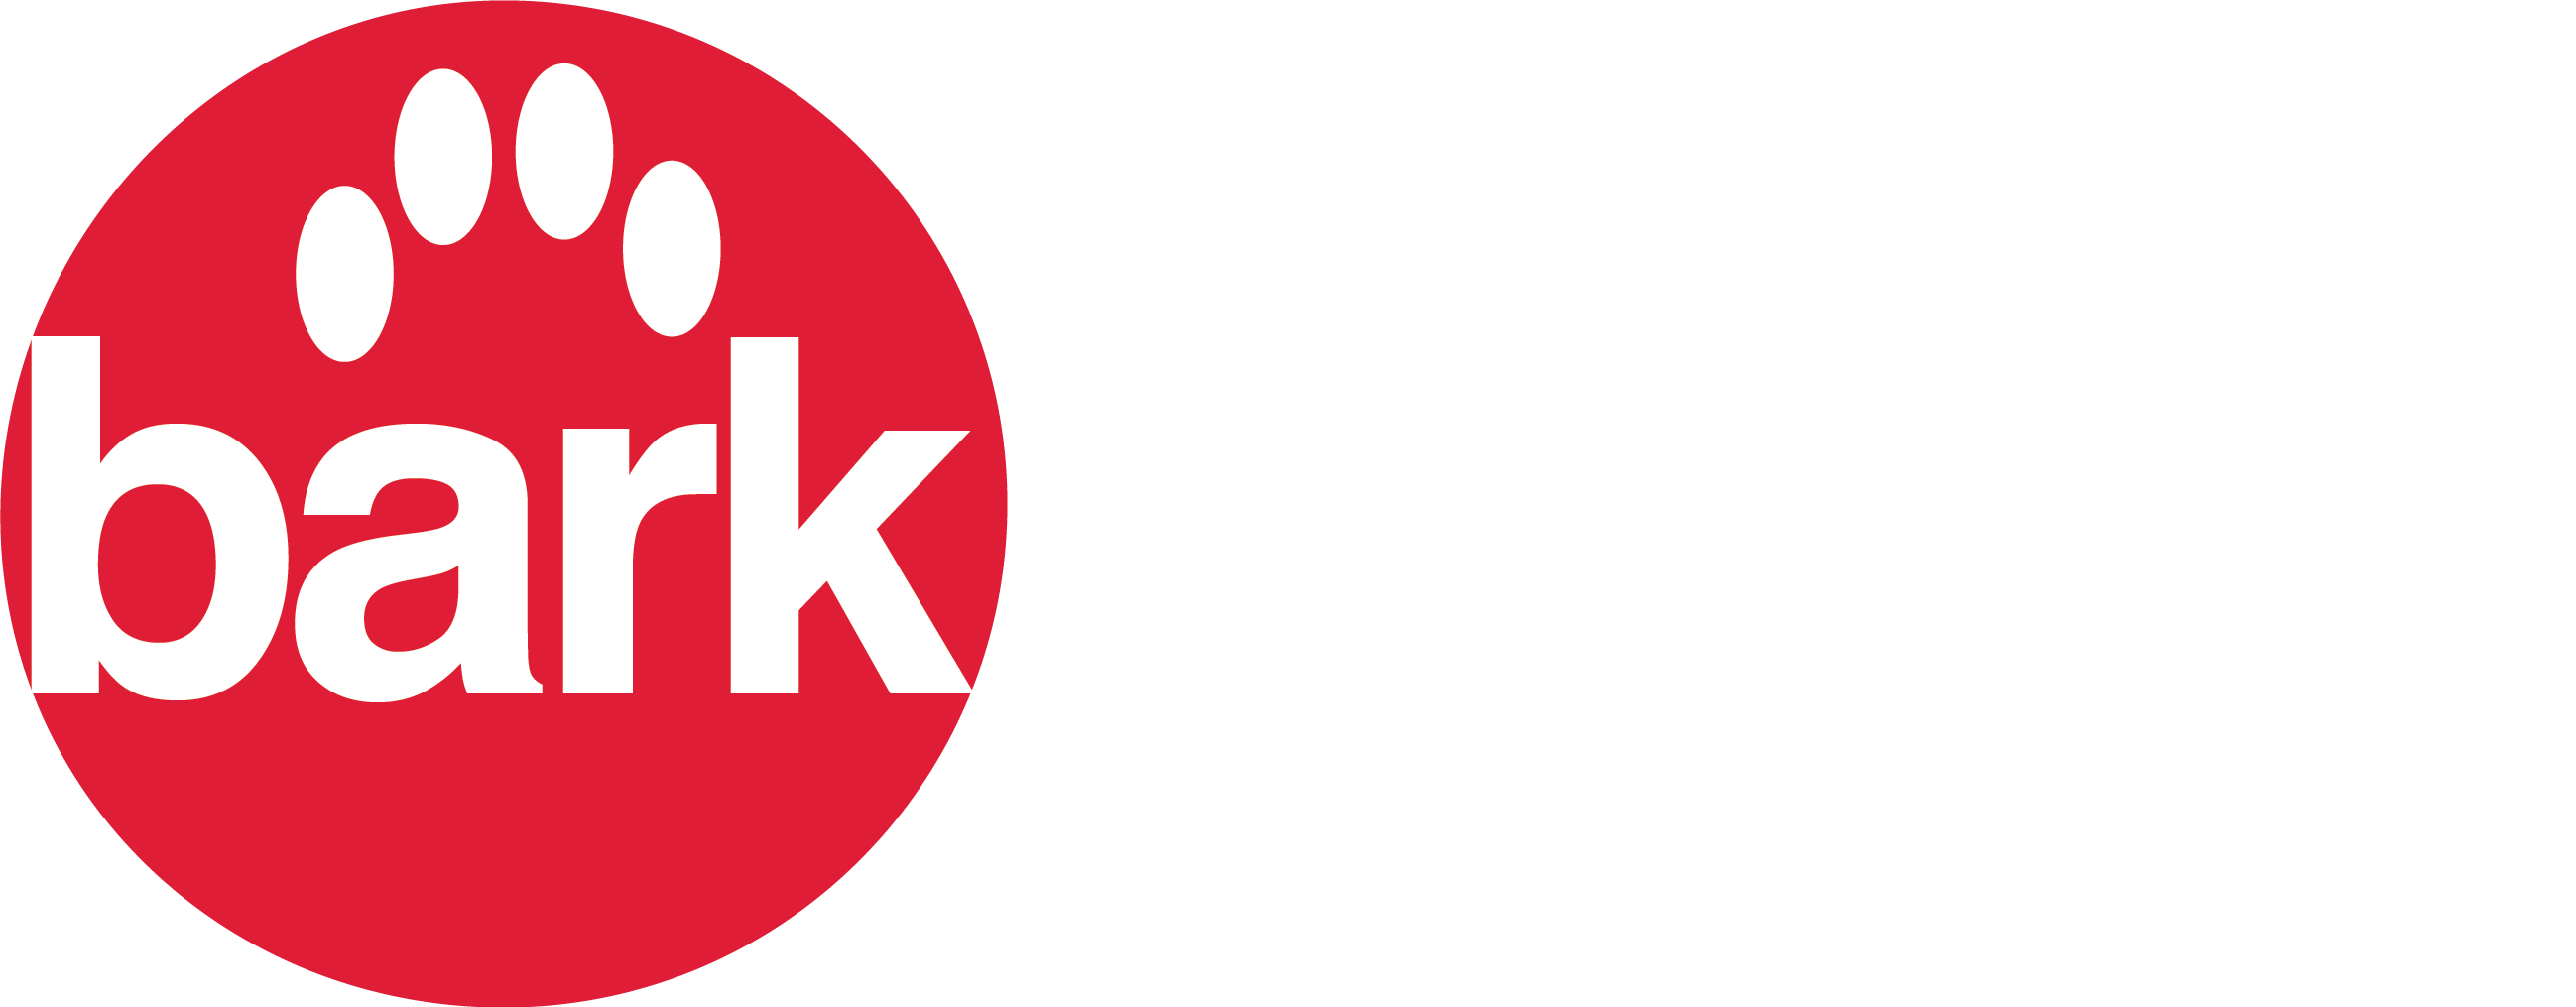 barkgarage.com logo